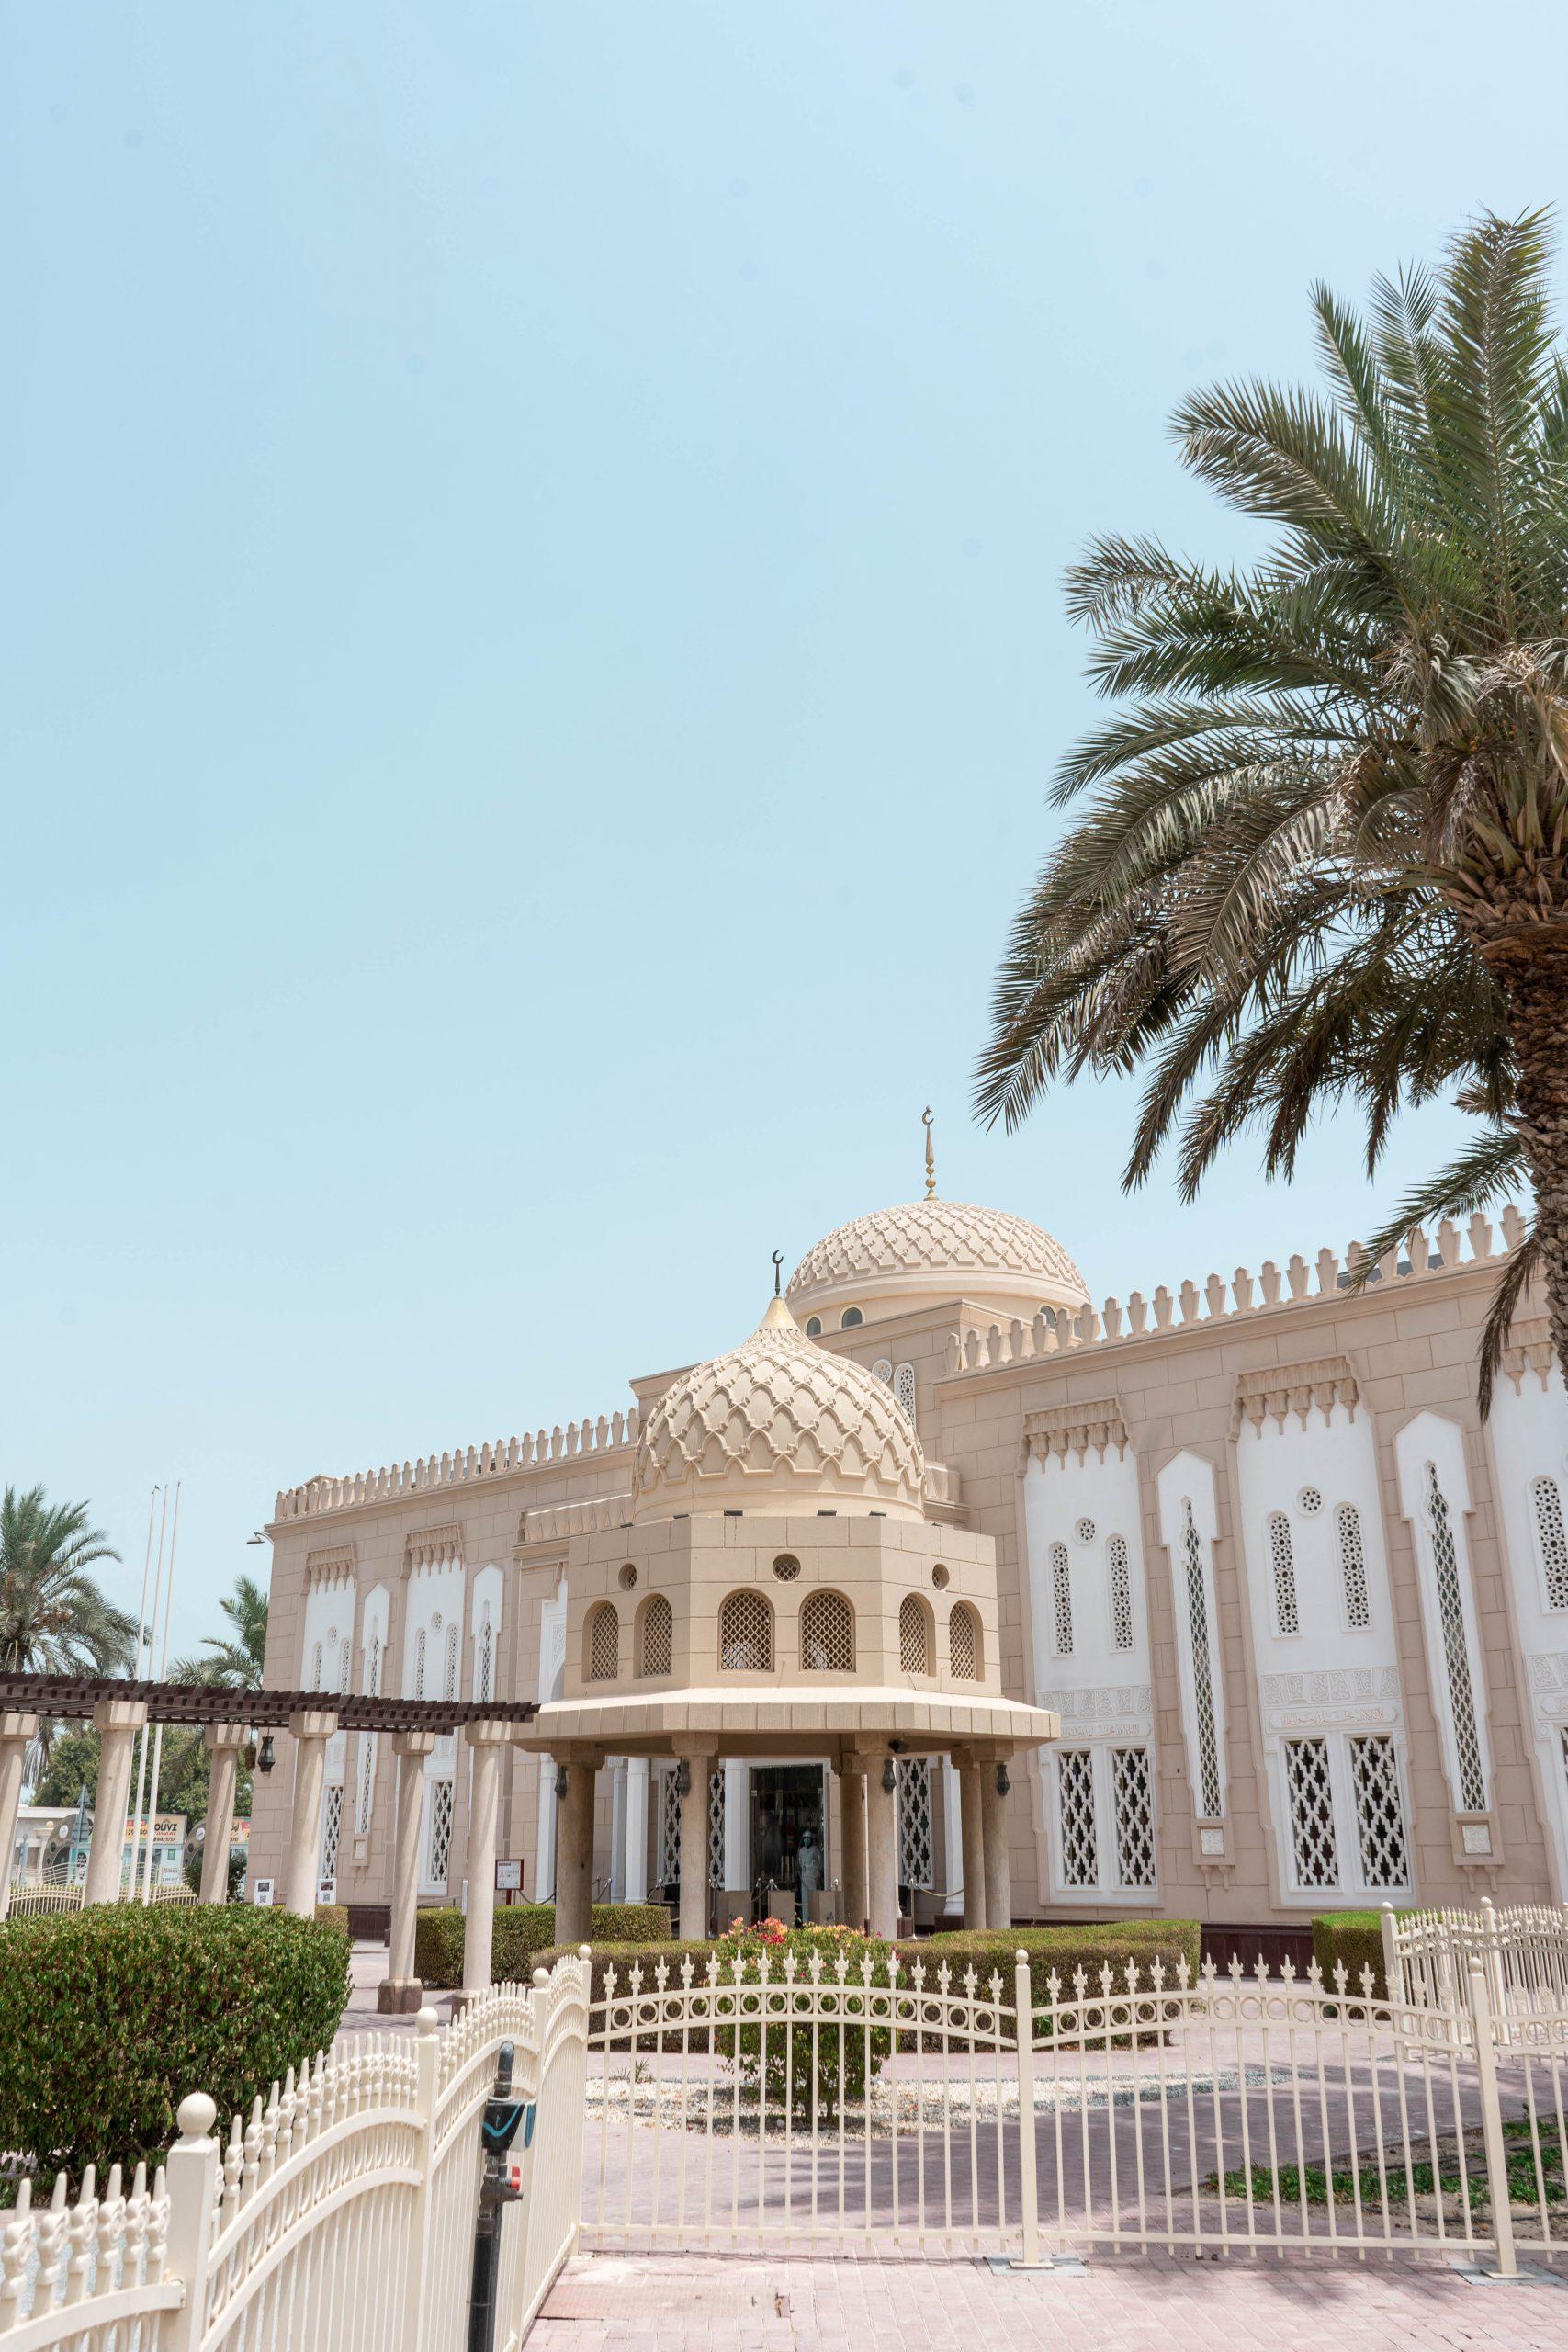 jumeirah mosque dubai uae united arab emirates masjid tourist entrance